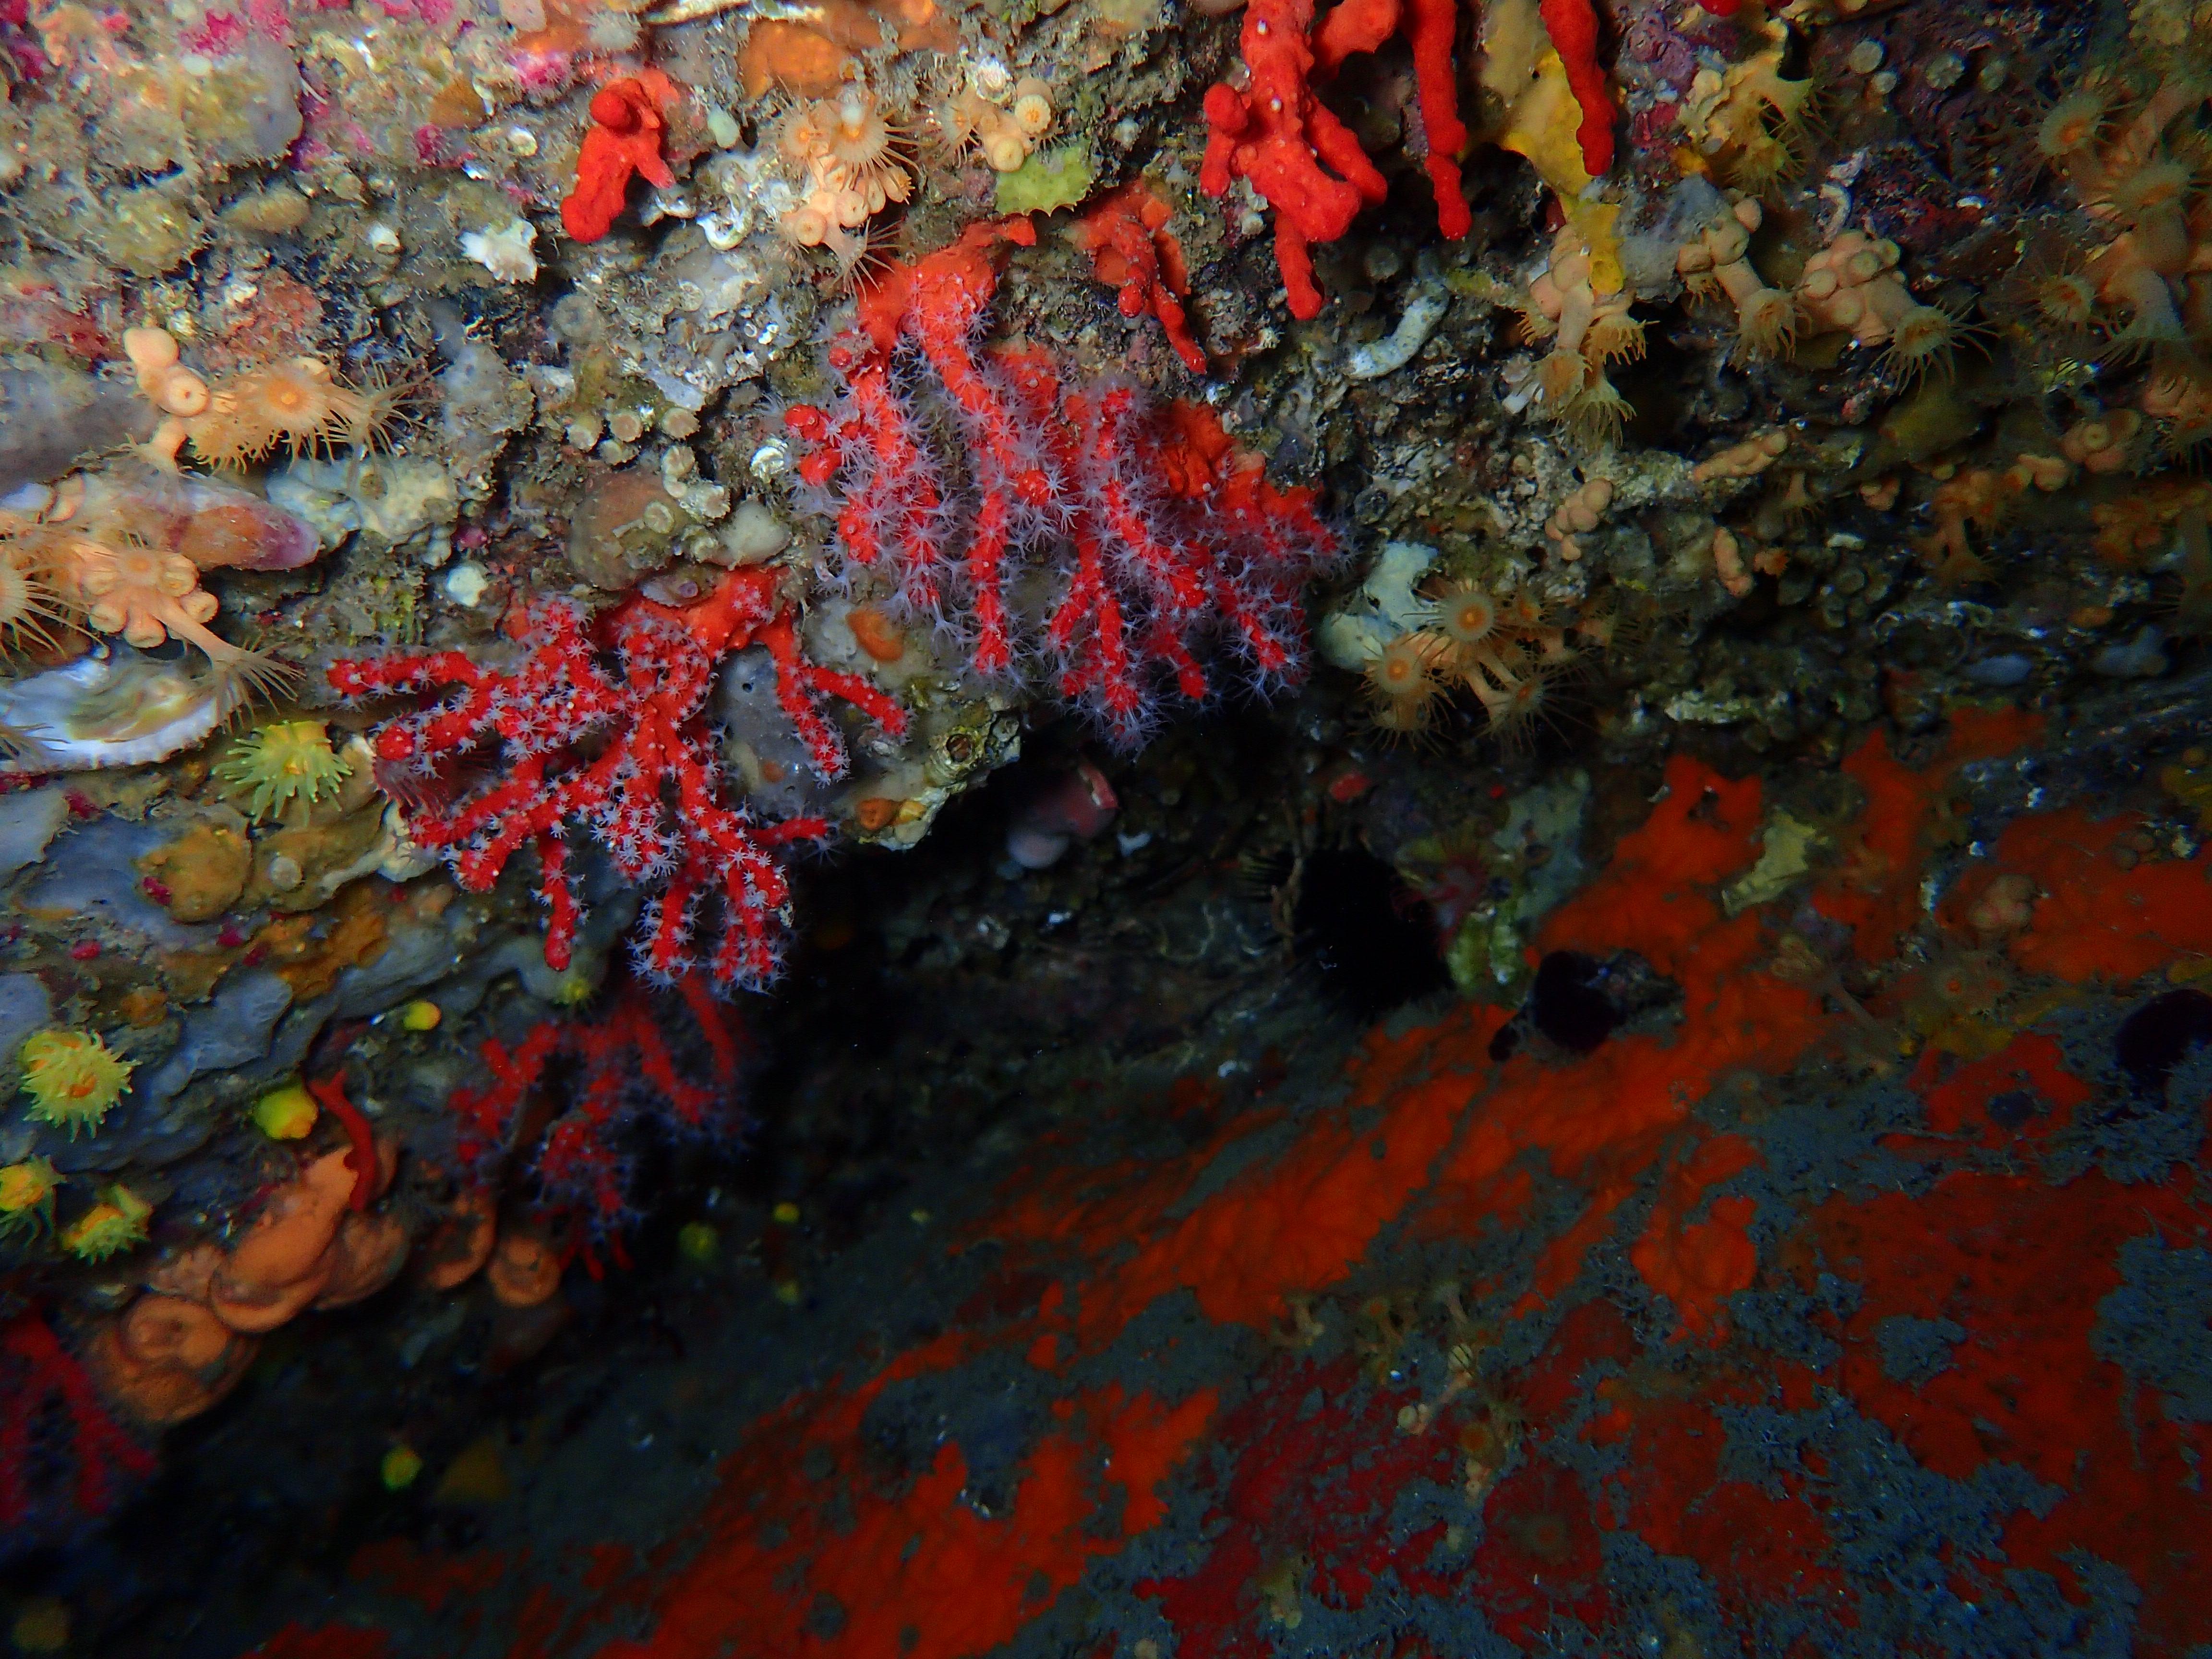 Corail Rouge - Aquablue - Banyuls-sur-me